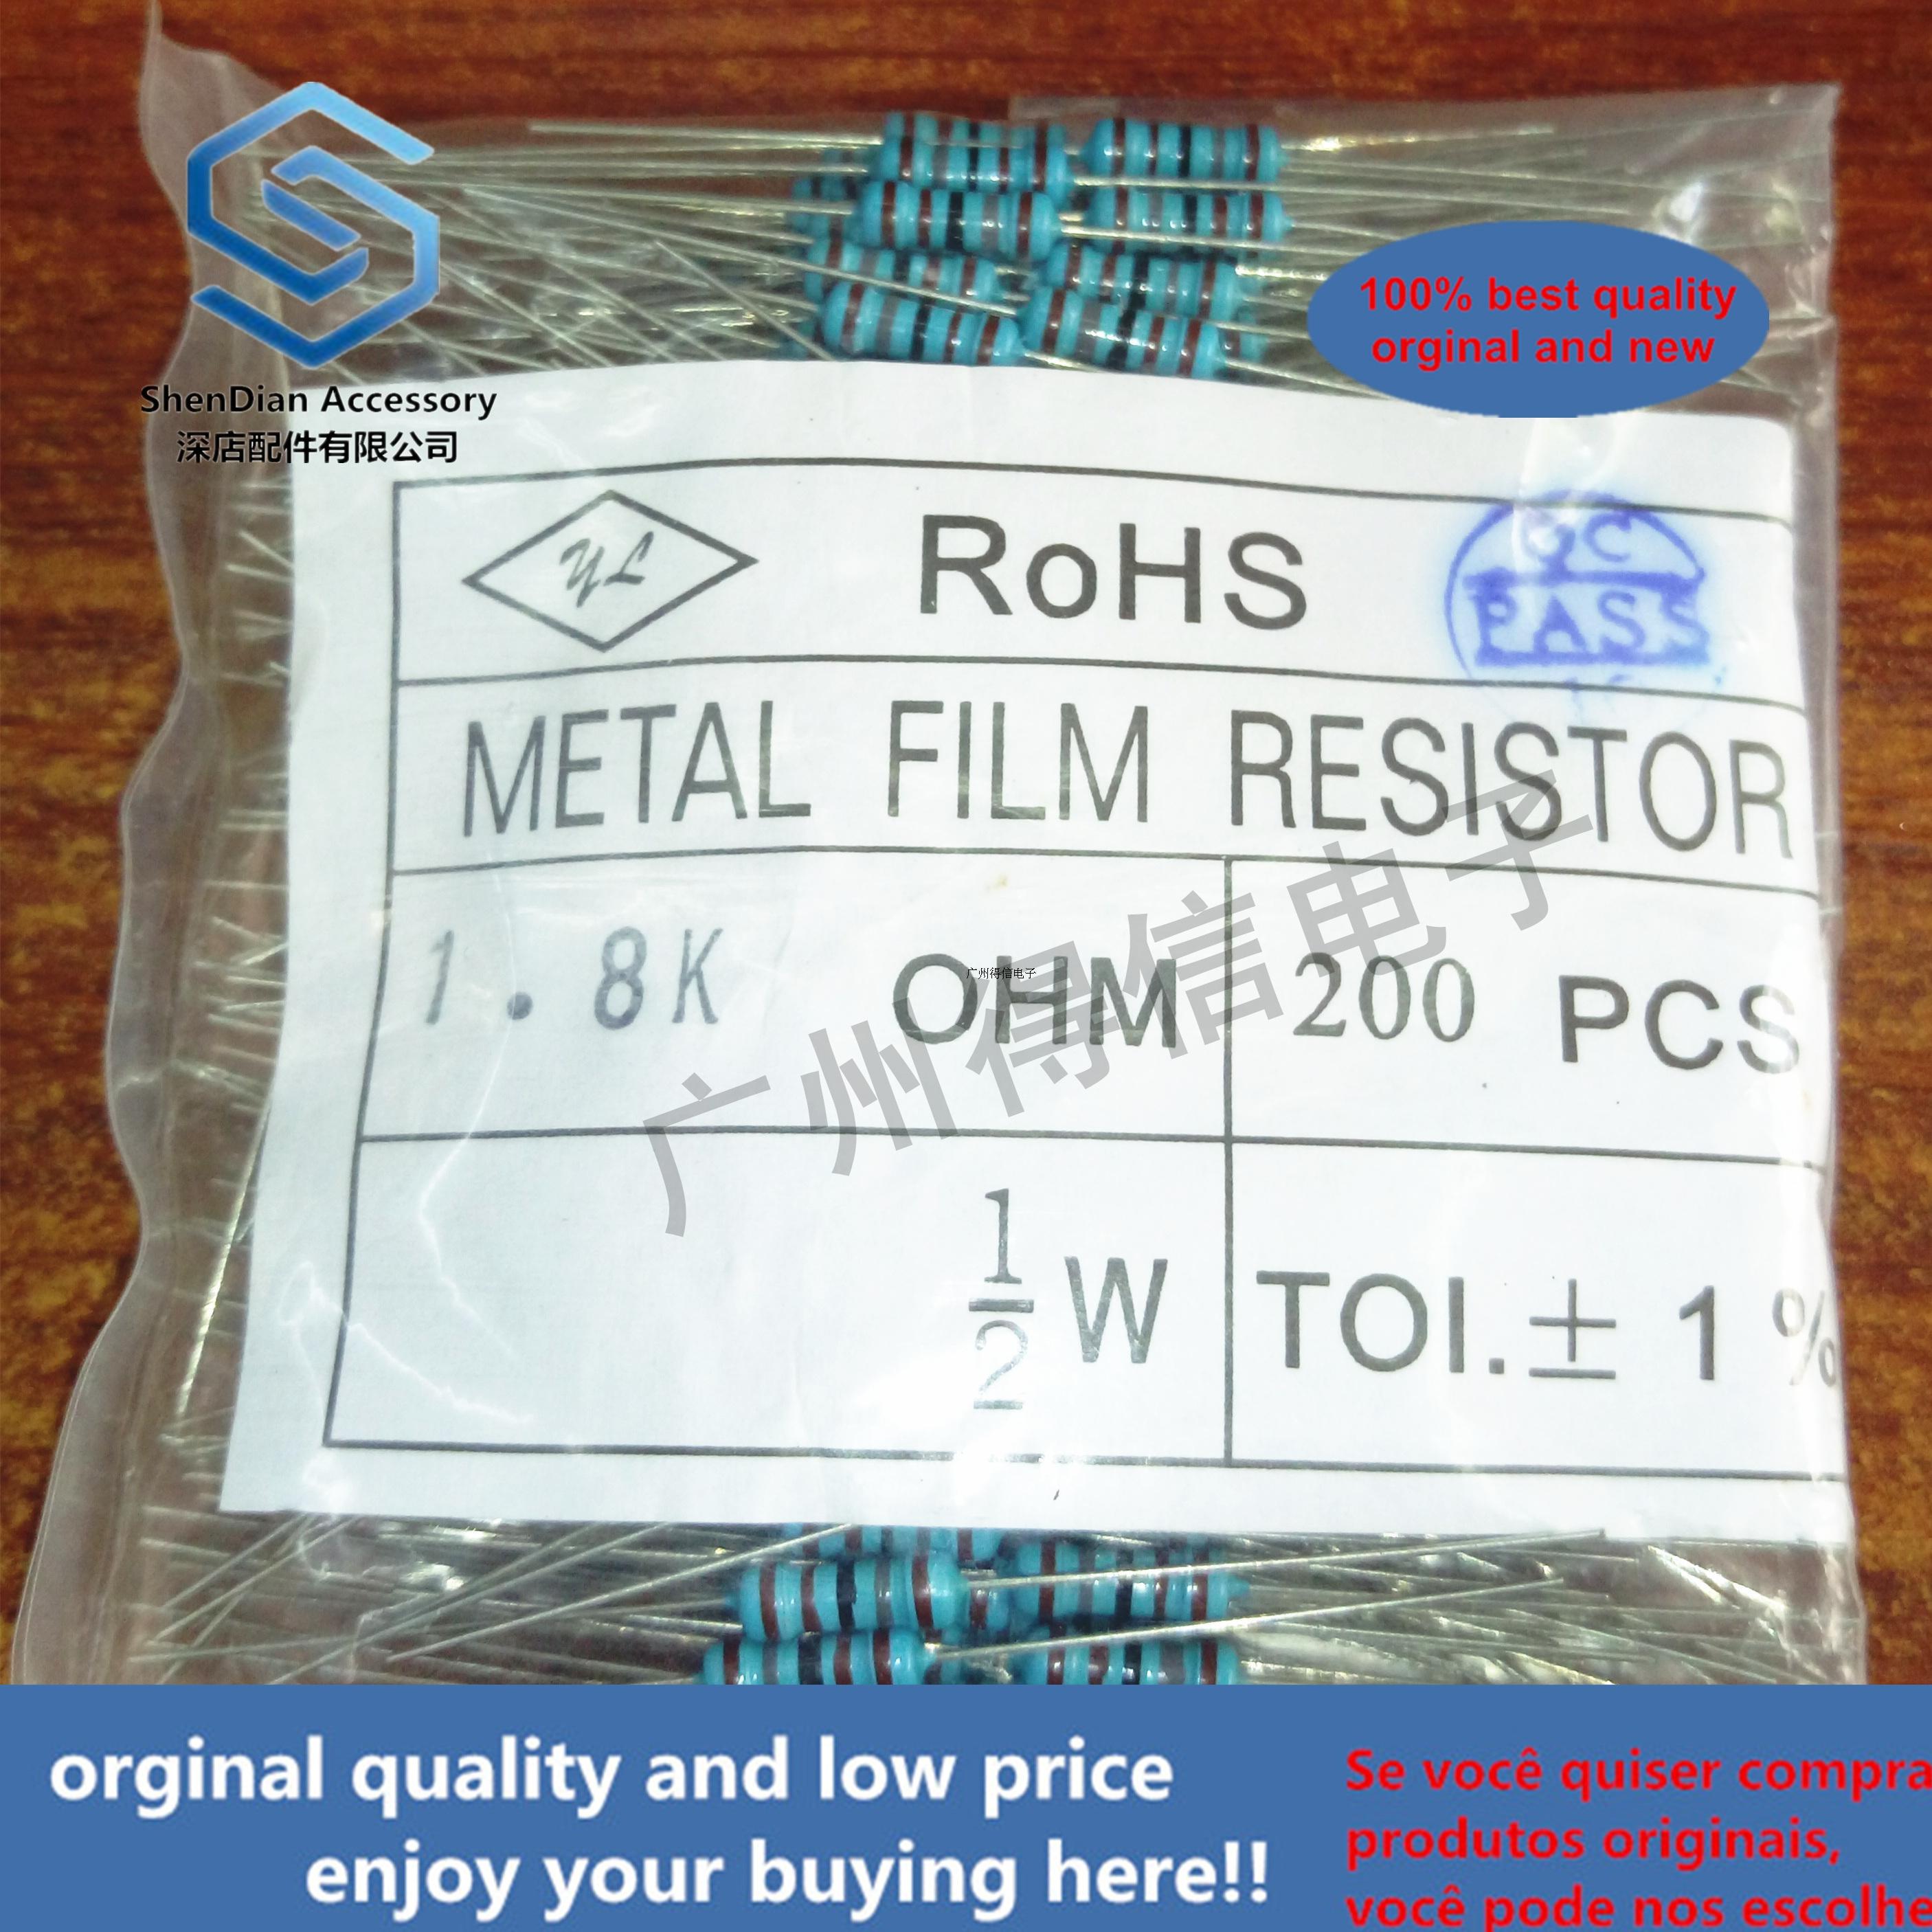 200pcs 1 / 2W 510R 510 Euro 1% Brand New Metal Film Iron Feet Resistor Bag 200 Pcs Per Pack